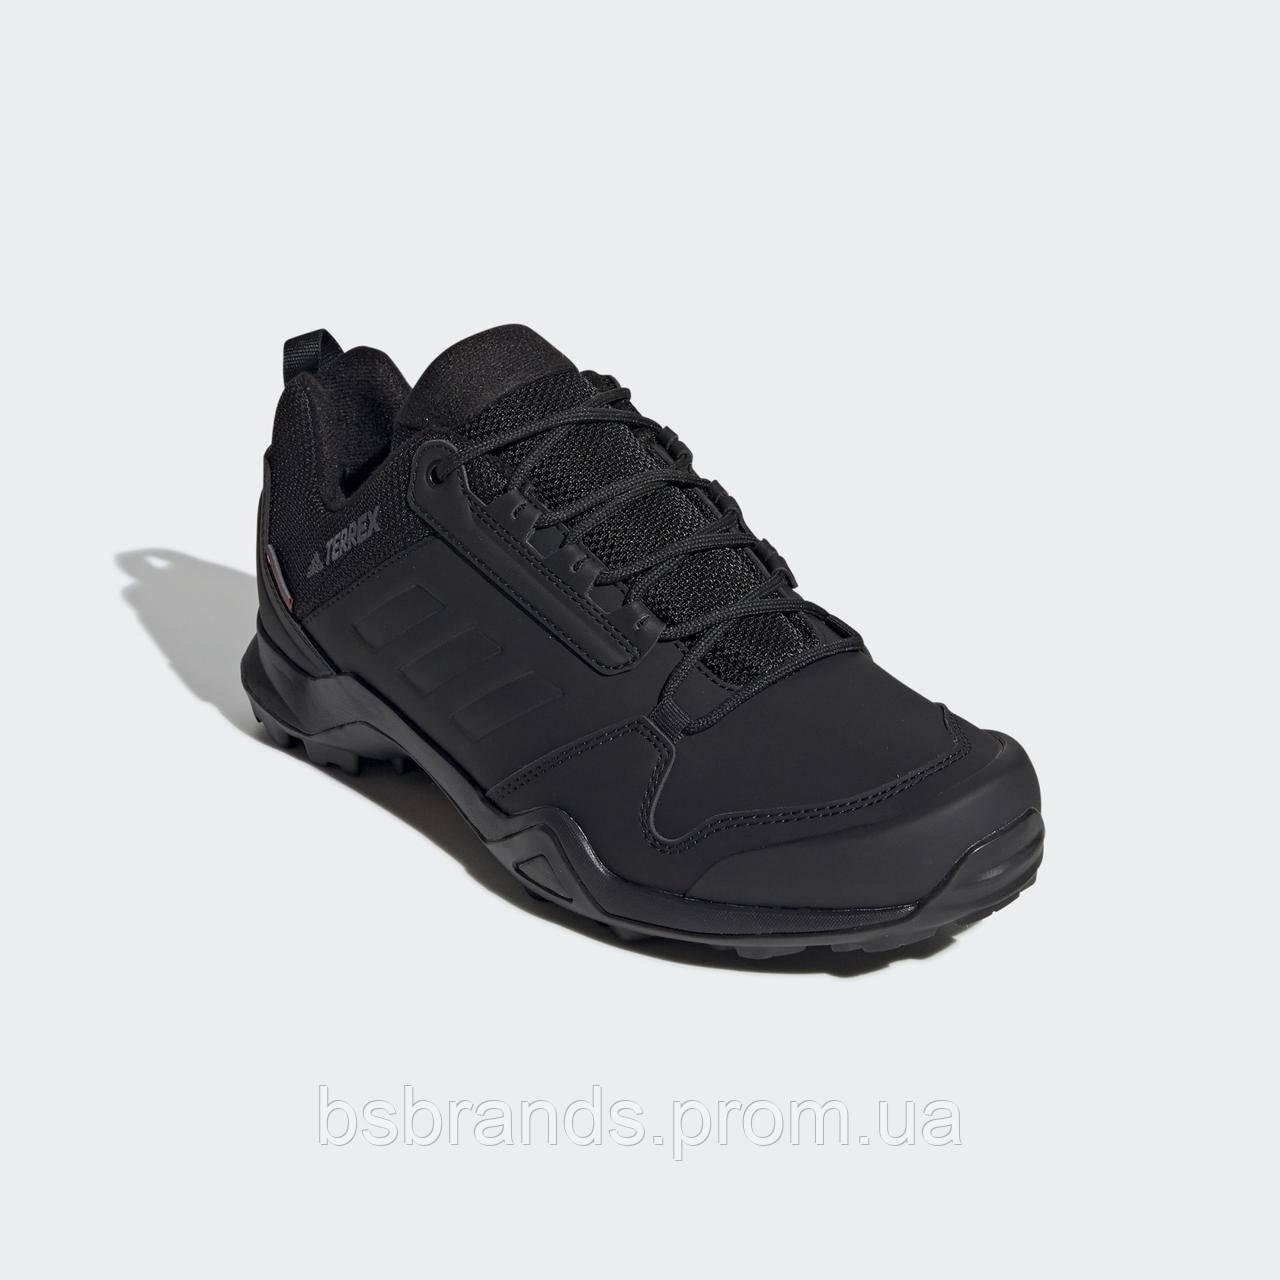 Мужские кроссовки адидас Terrex AX3 Beta Climawarm G26523 (2020/2)